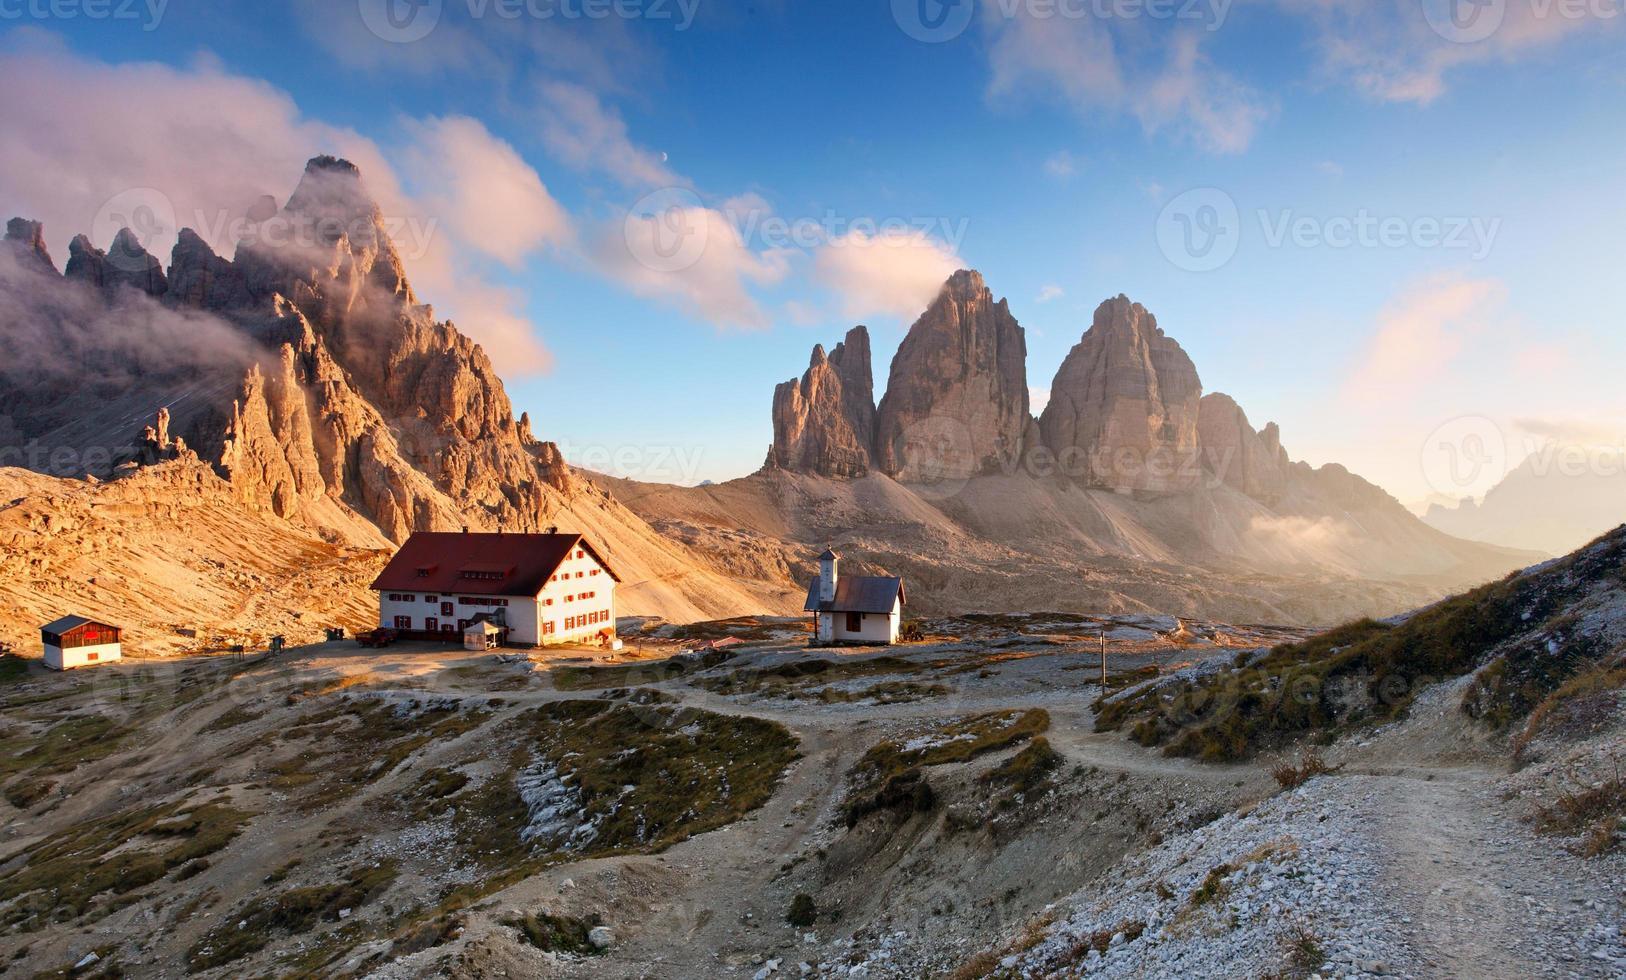 Sunset mountain in Italy Dolomites - Tre Cime photo